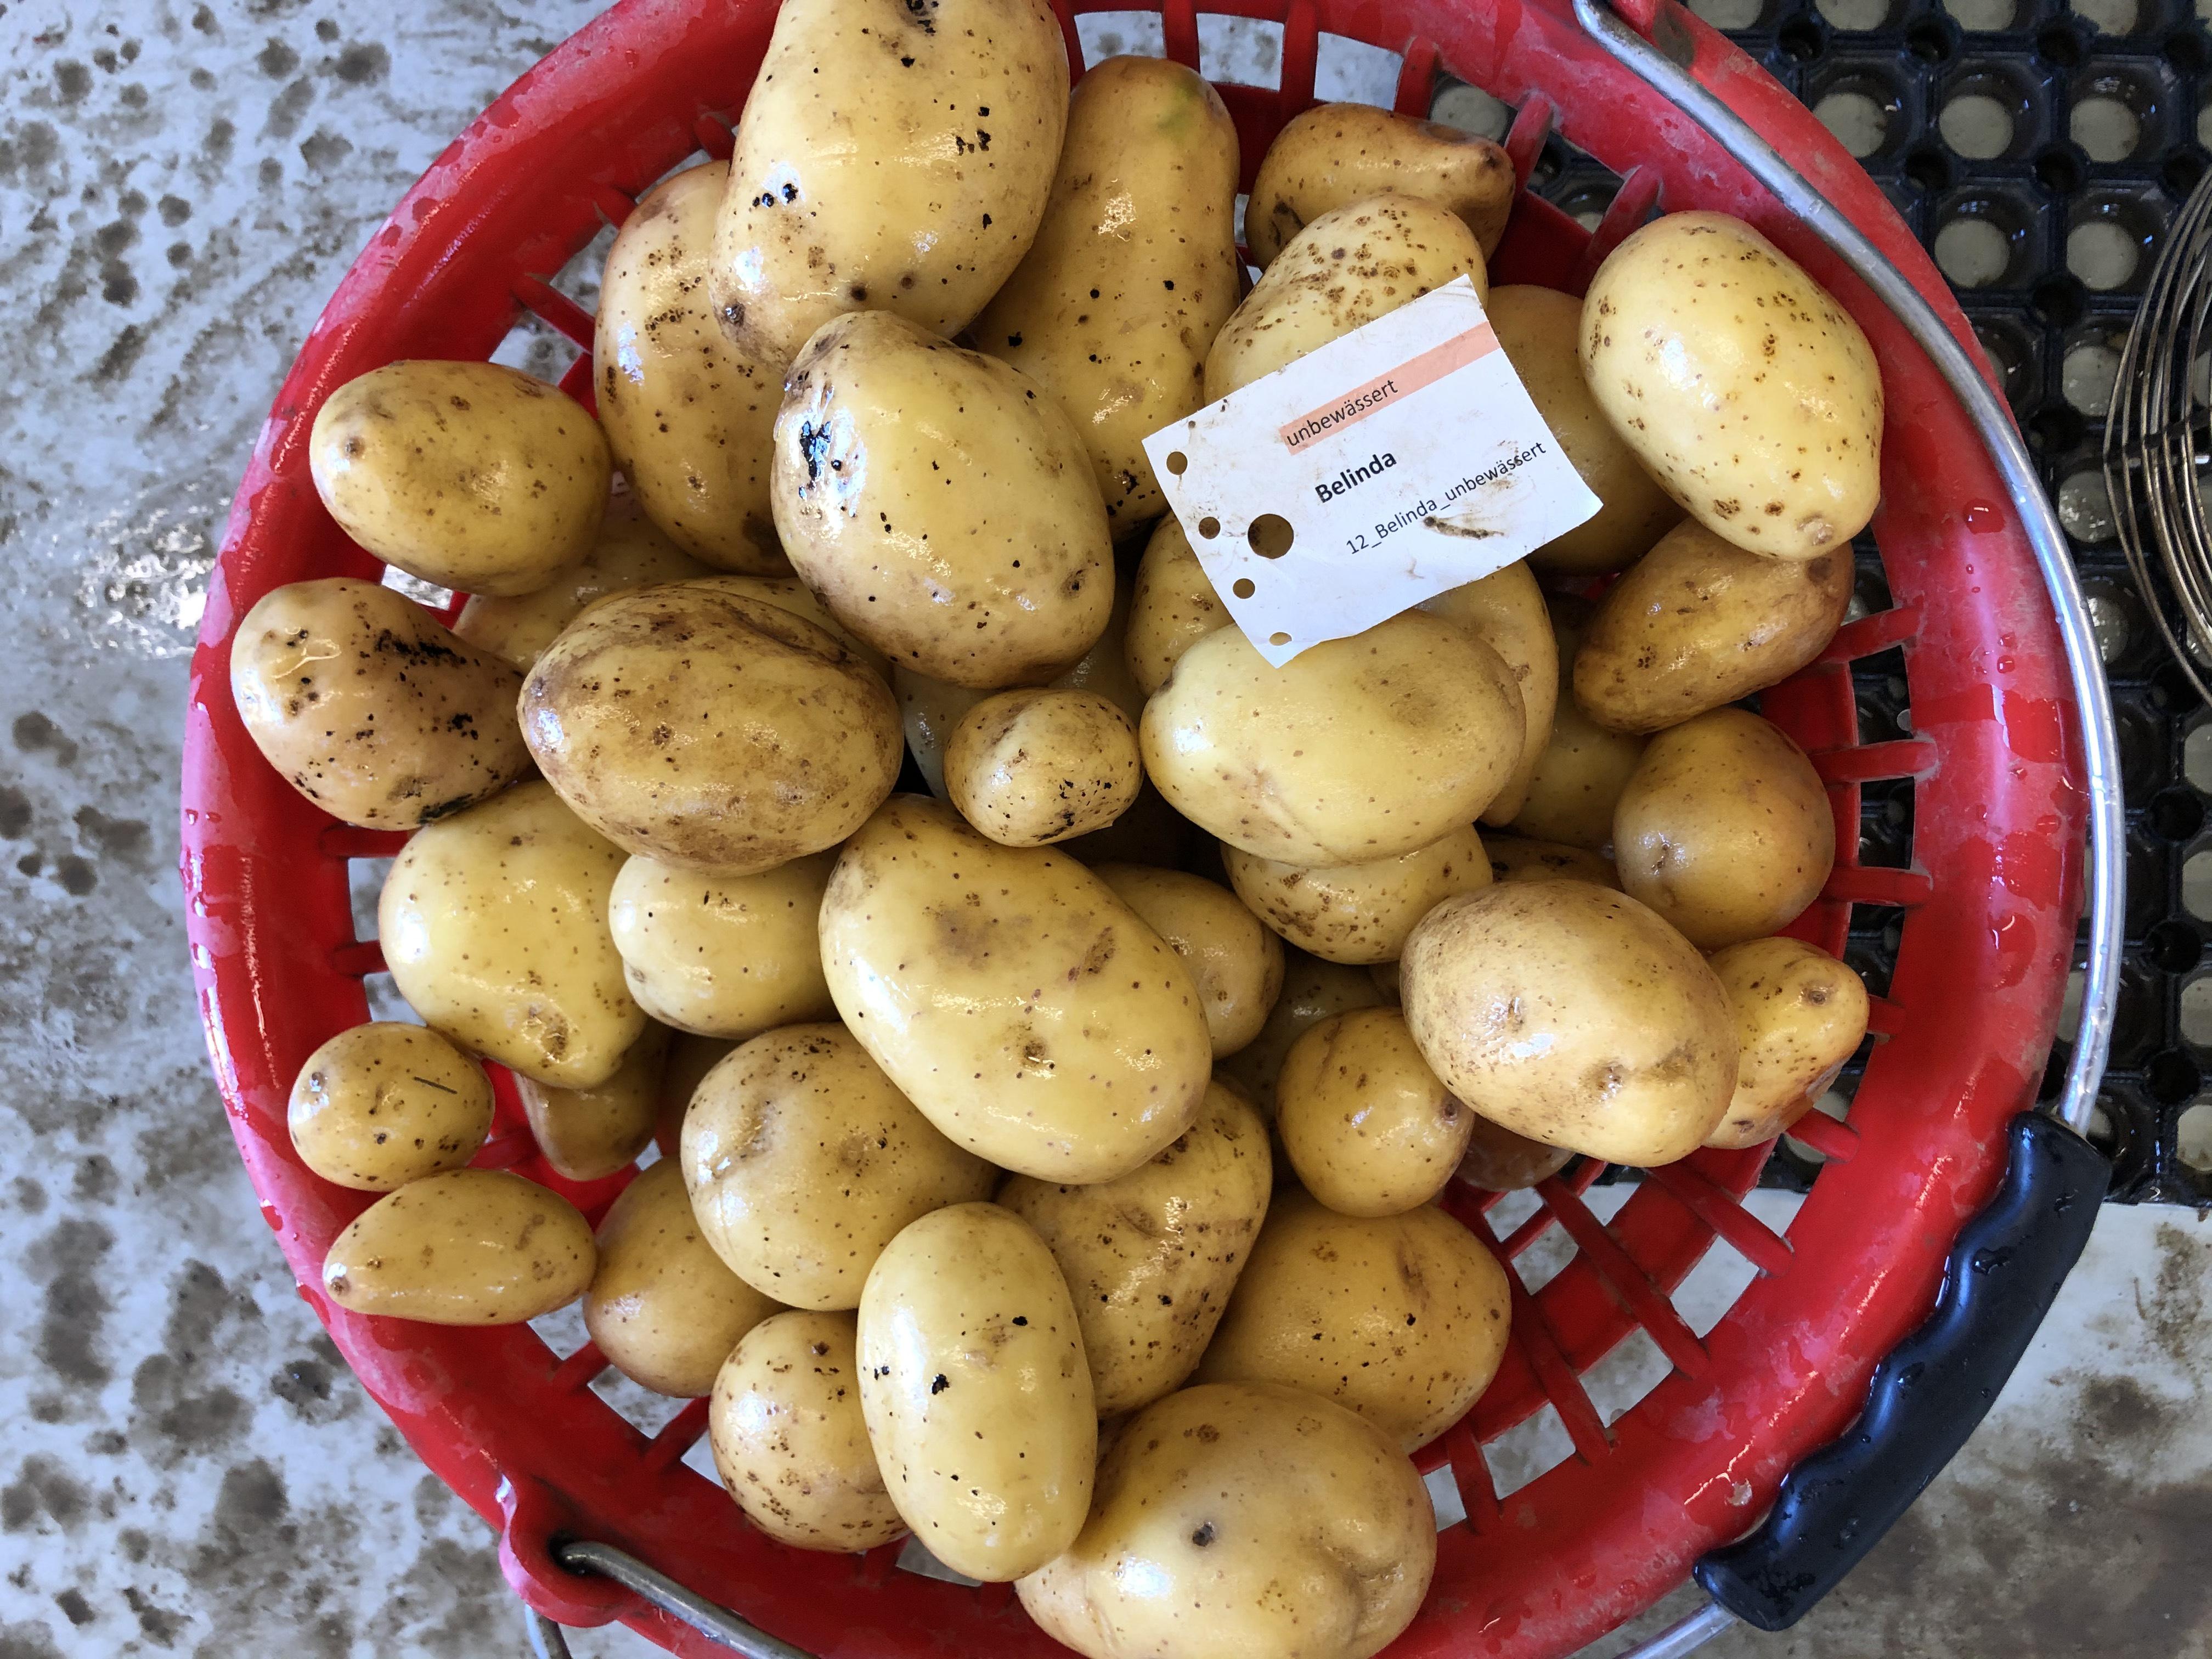 Waschprobe Sorte Bellinda, Sortenversuch Kartoffeln 2020 Humlikon